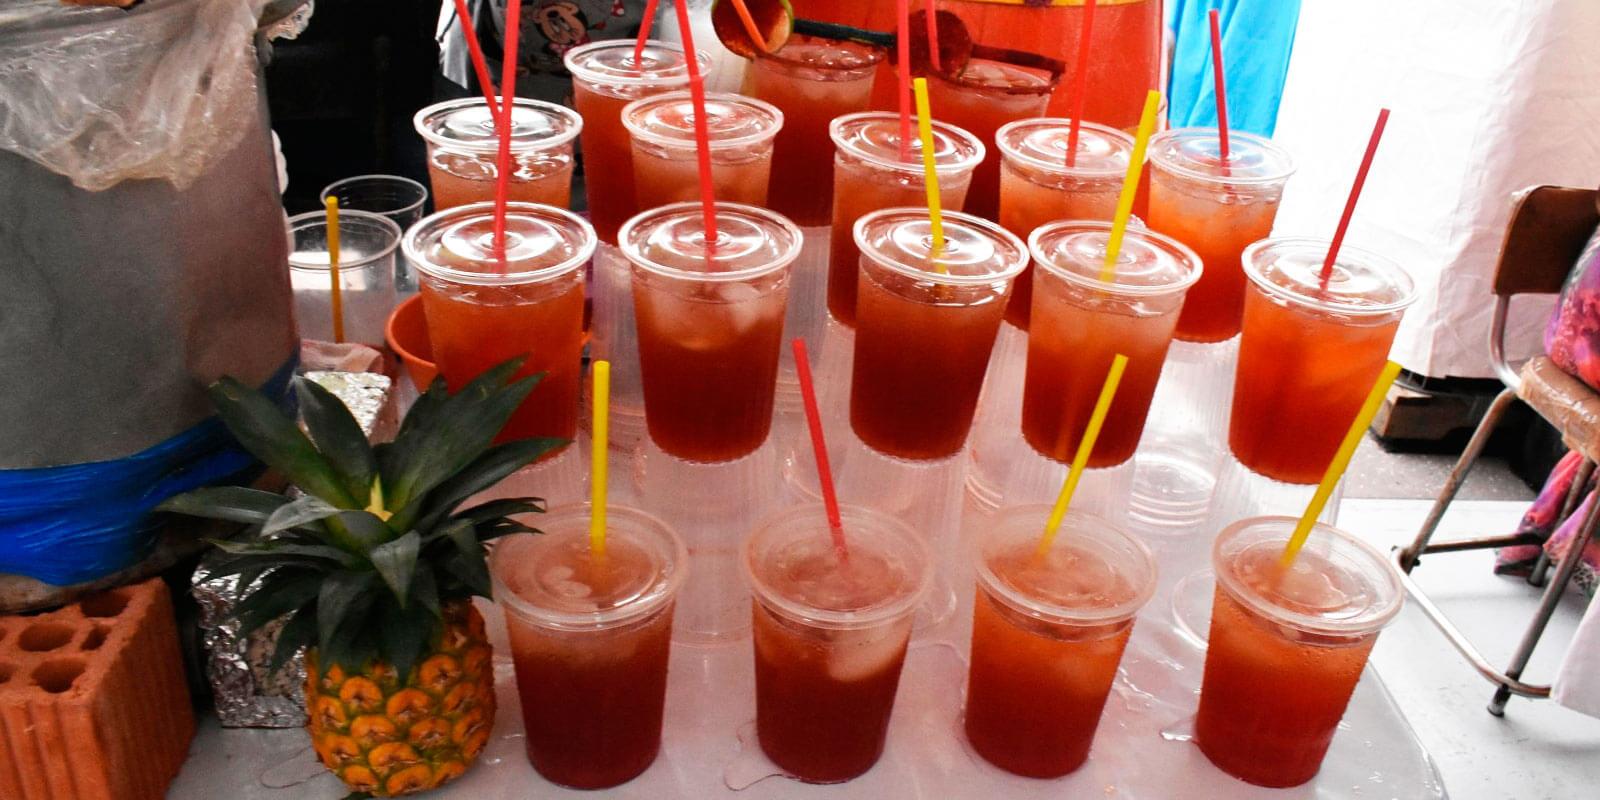 El tepache es una bebida mexicana